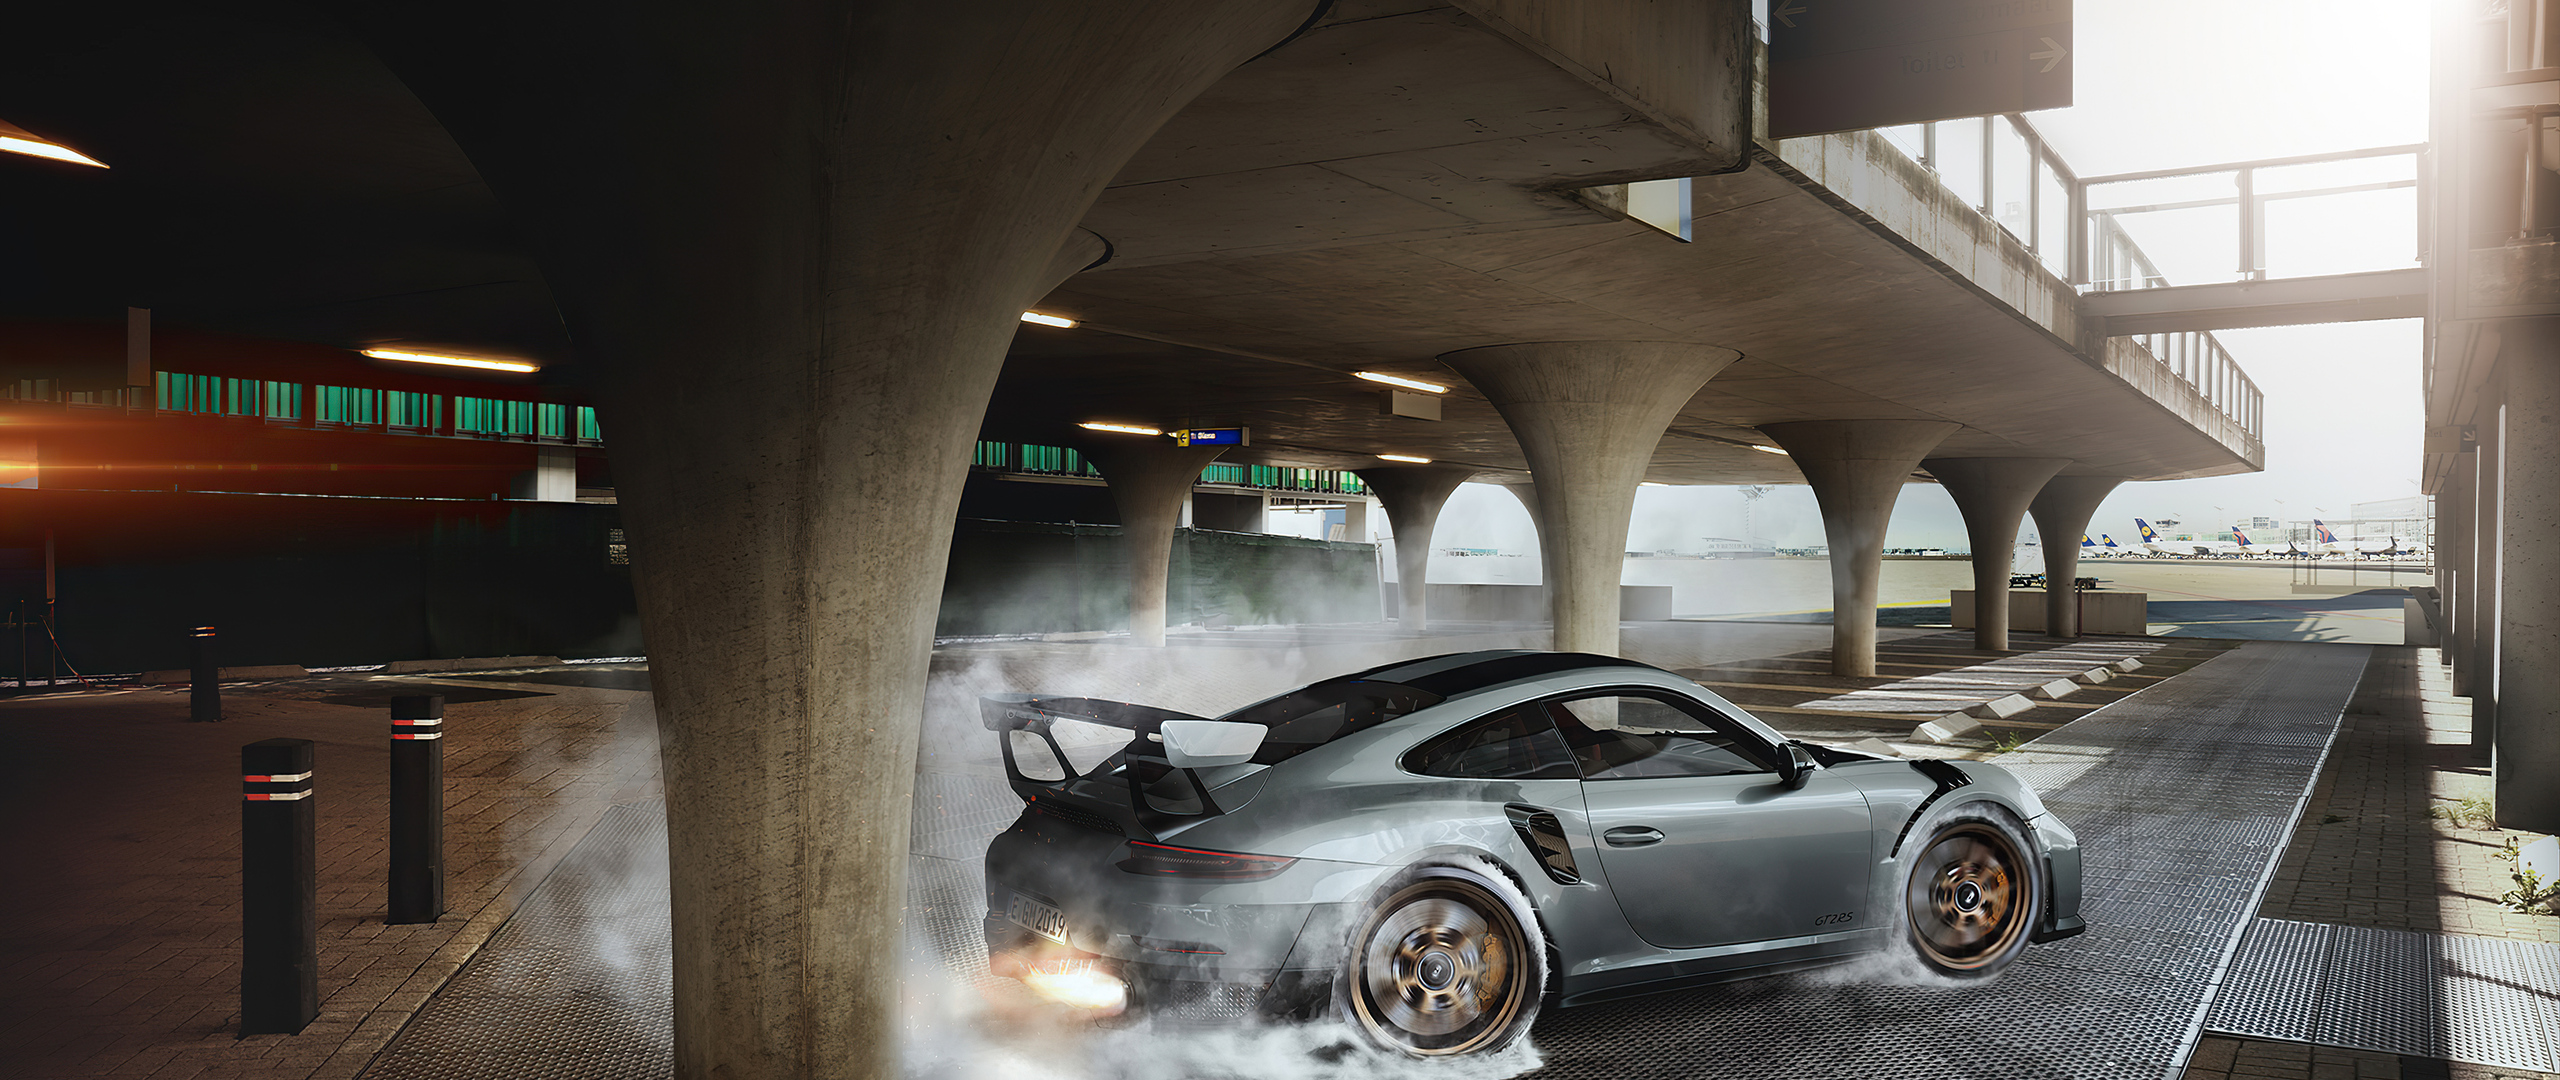 porsche-gt2-rs-burning-the-wheels-4k-vc.jpg